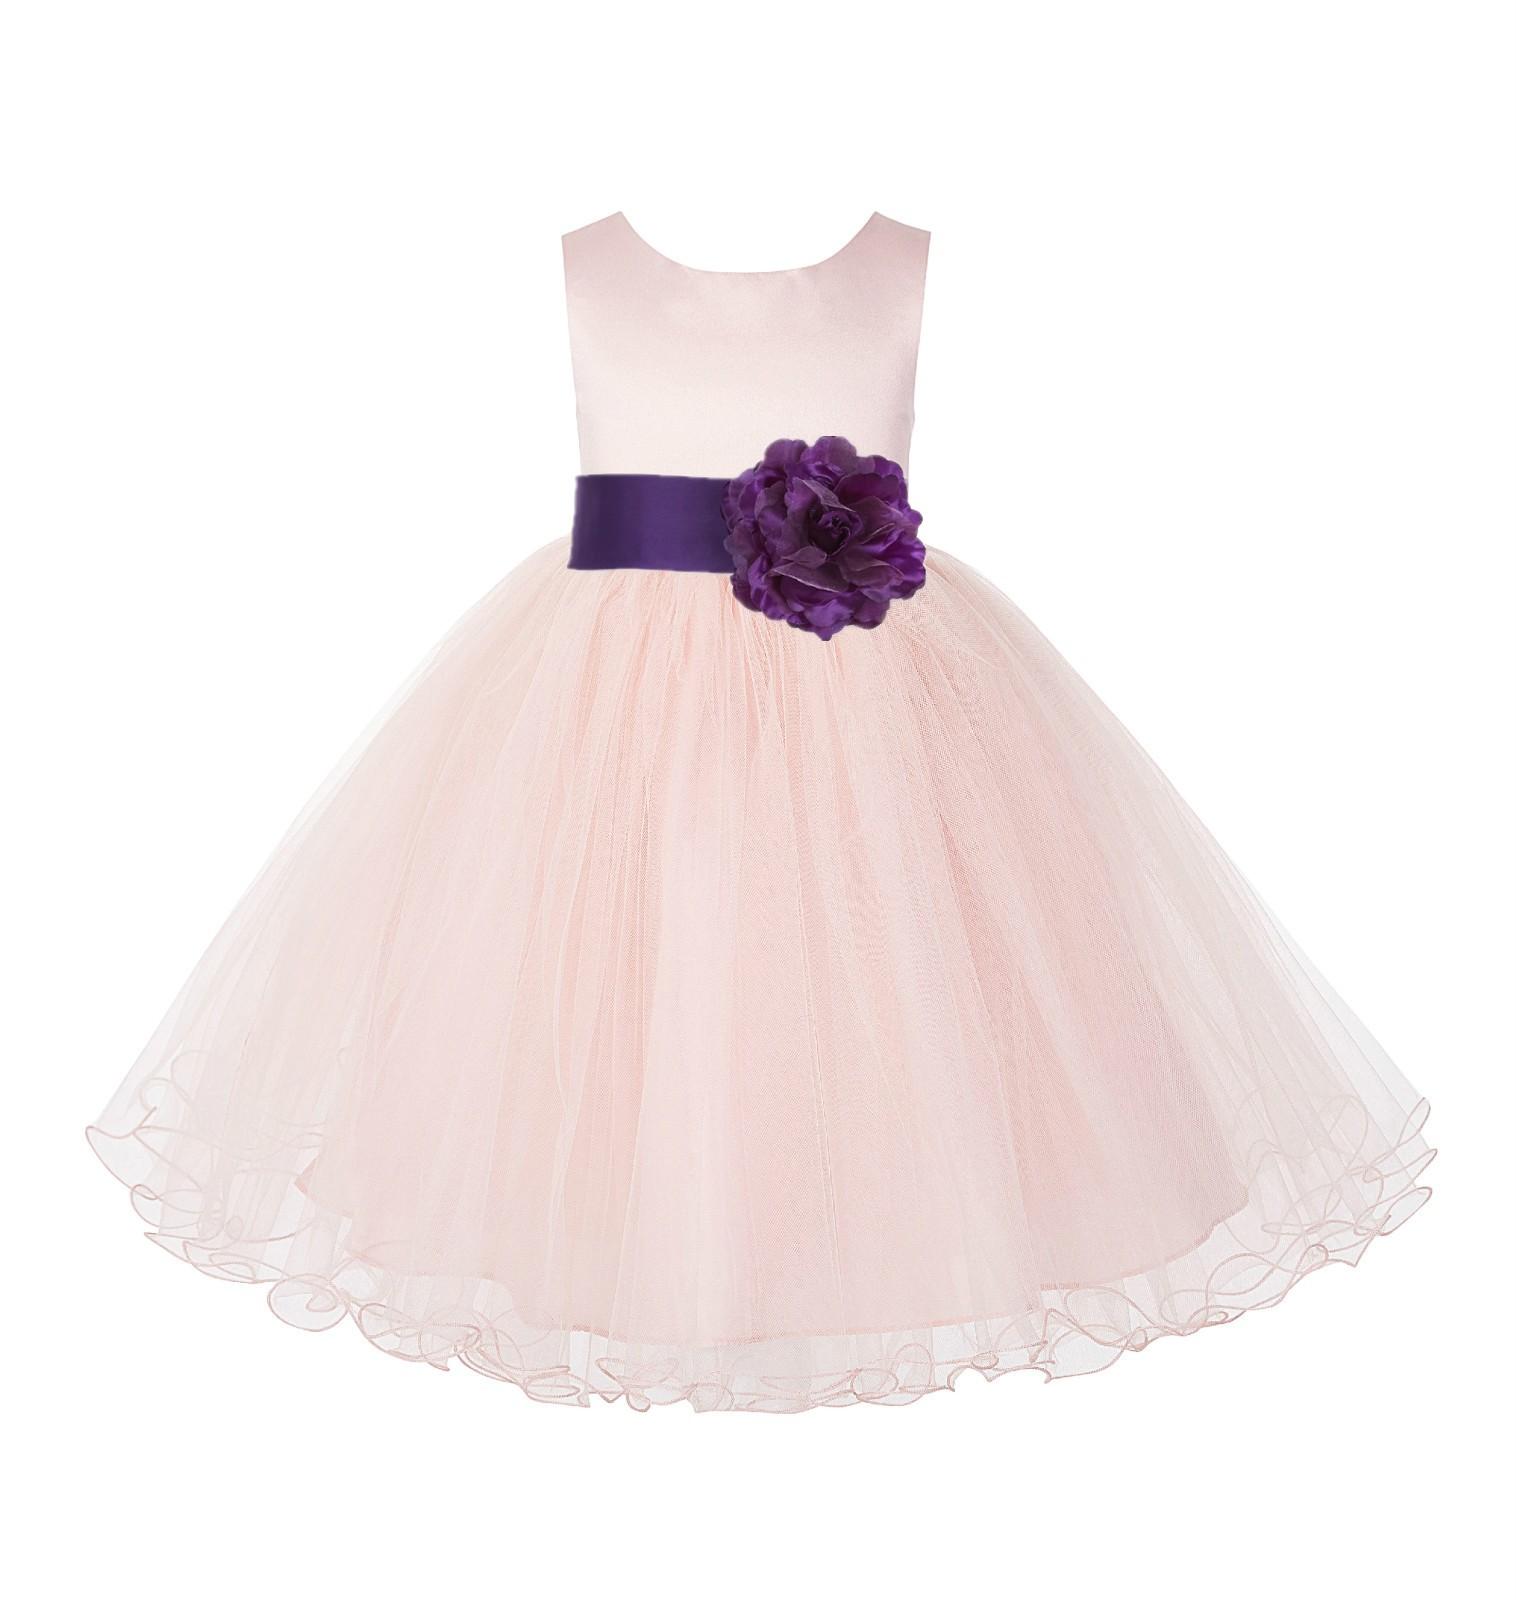 Blush Pink / Purple Tulle Rattail Edge Flower Girl Dress Pageant Recital 829S